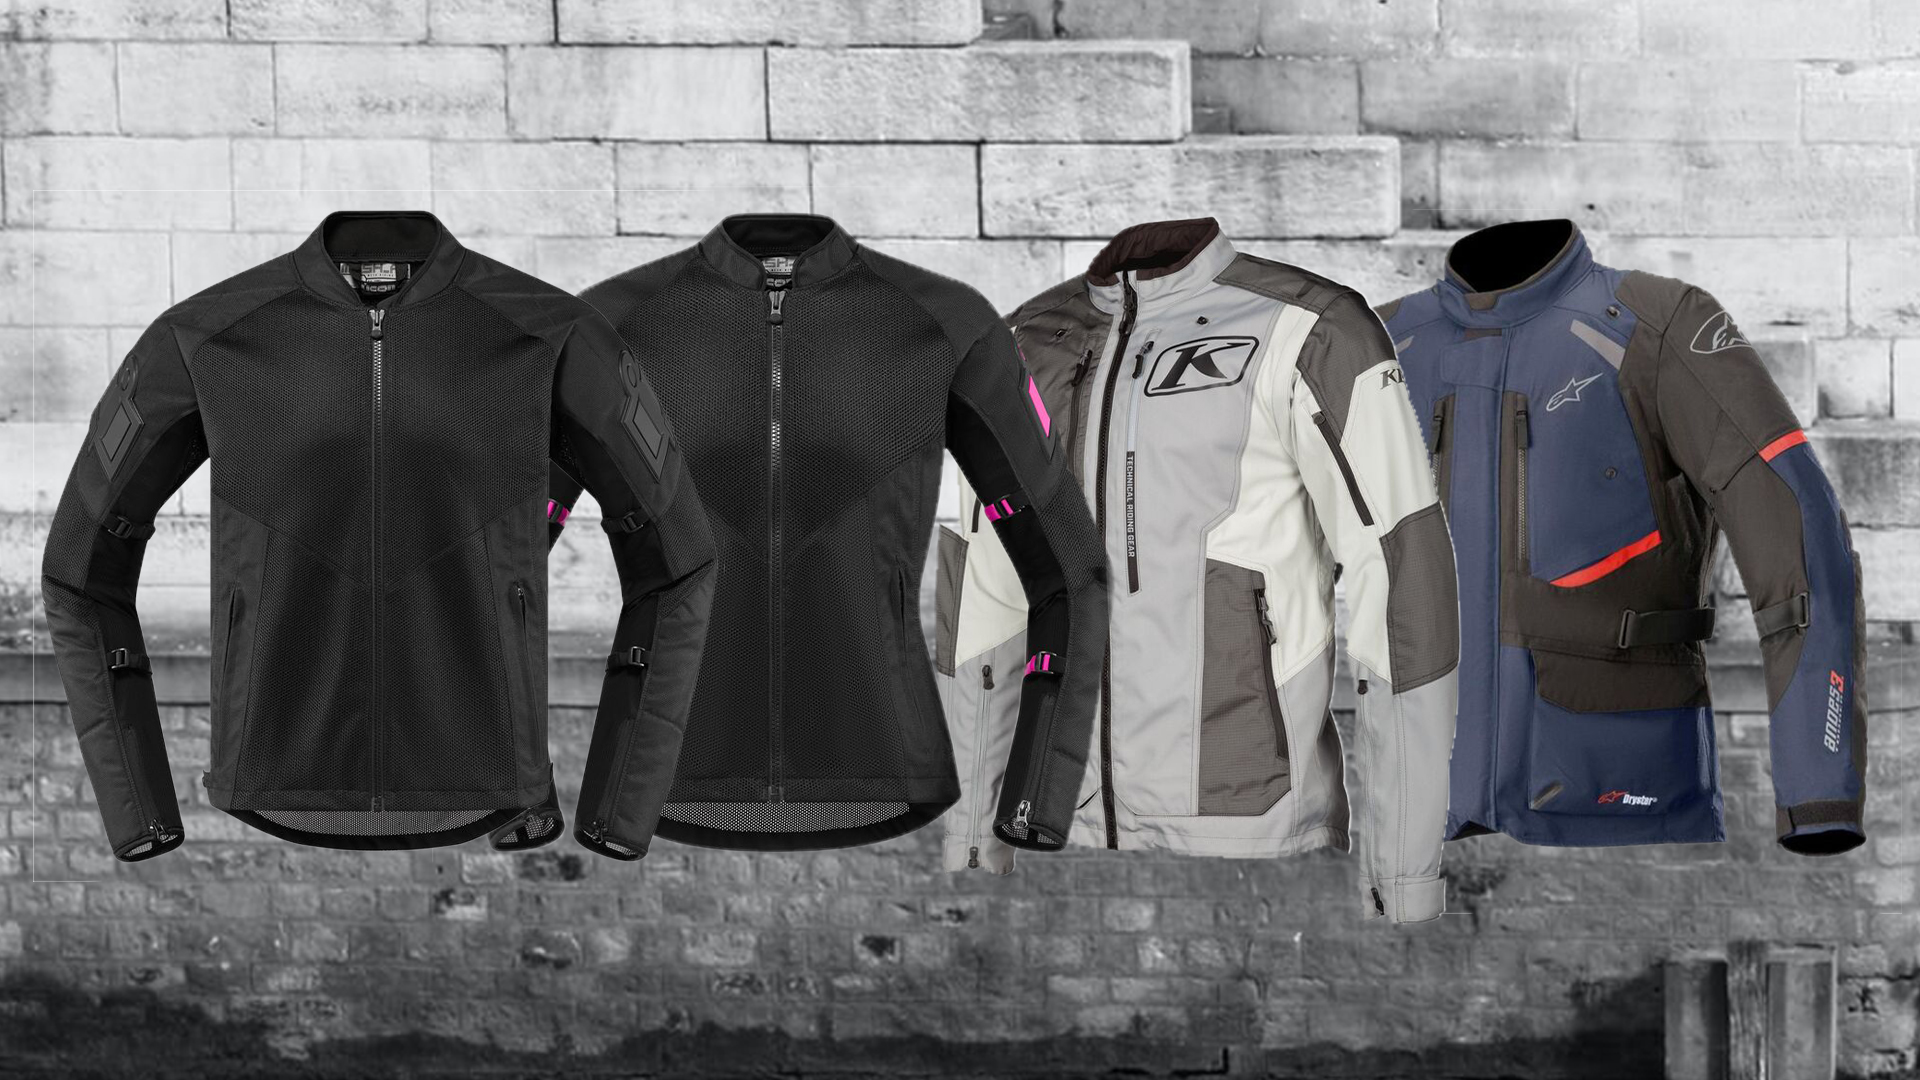 Texttile Motorcycle Jackets Under 500